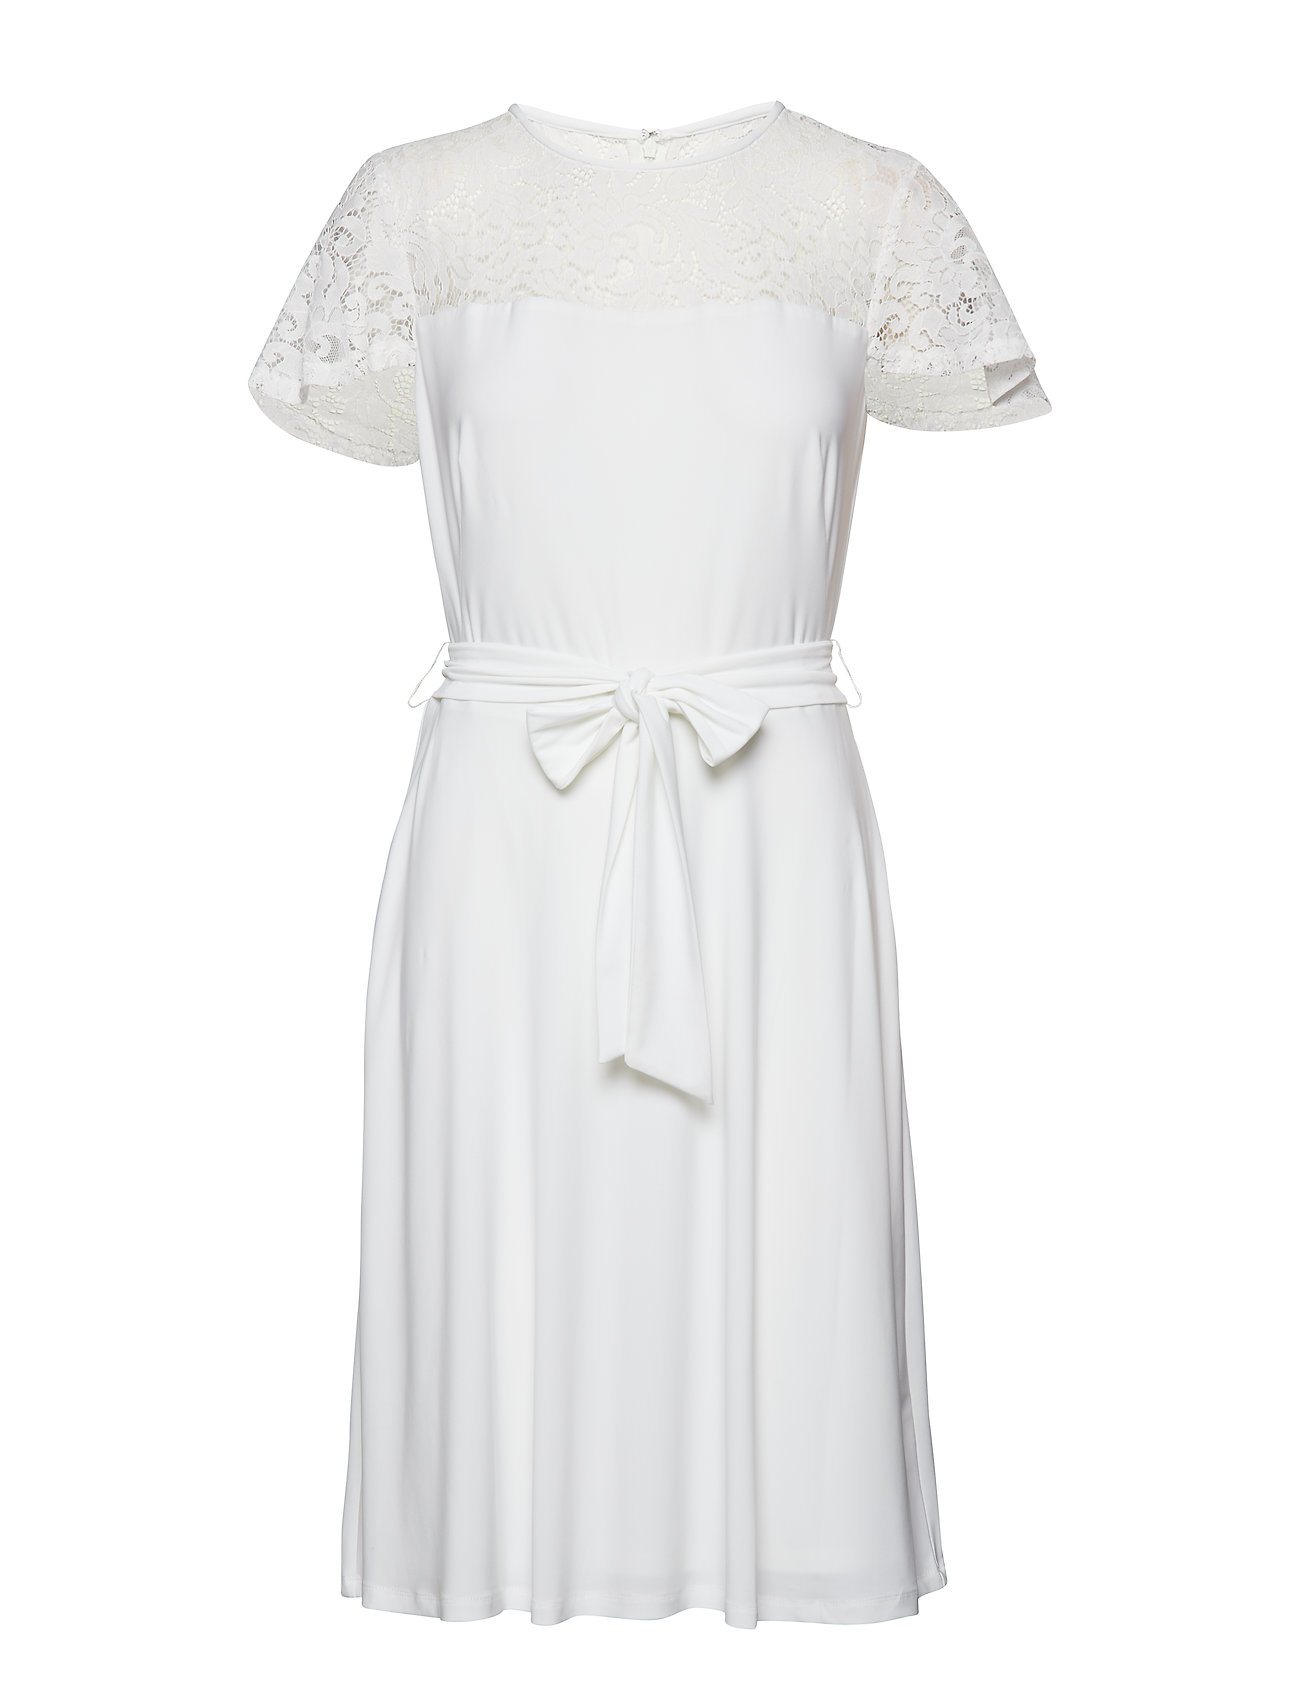 Belted WhiteLauren Lace Ralph Dresslauren trim hdtrsQ